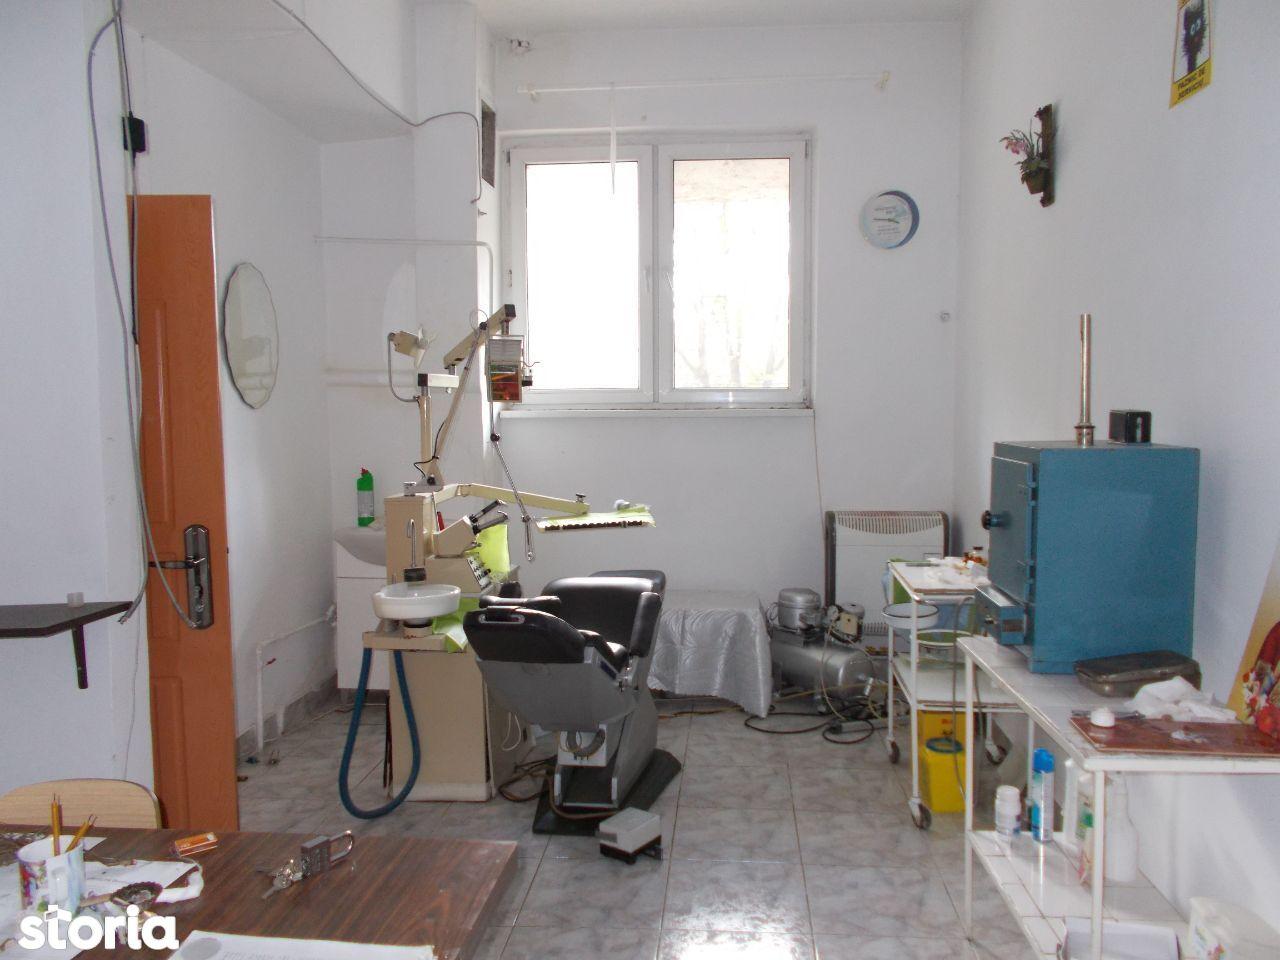 Vinzare spatiu Cabinet Medical Cal. Calarasilor - Viziru